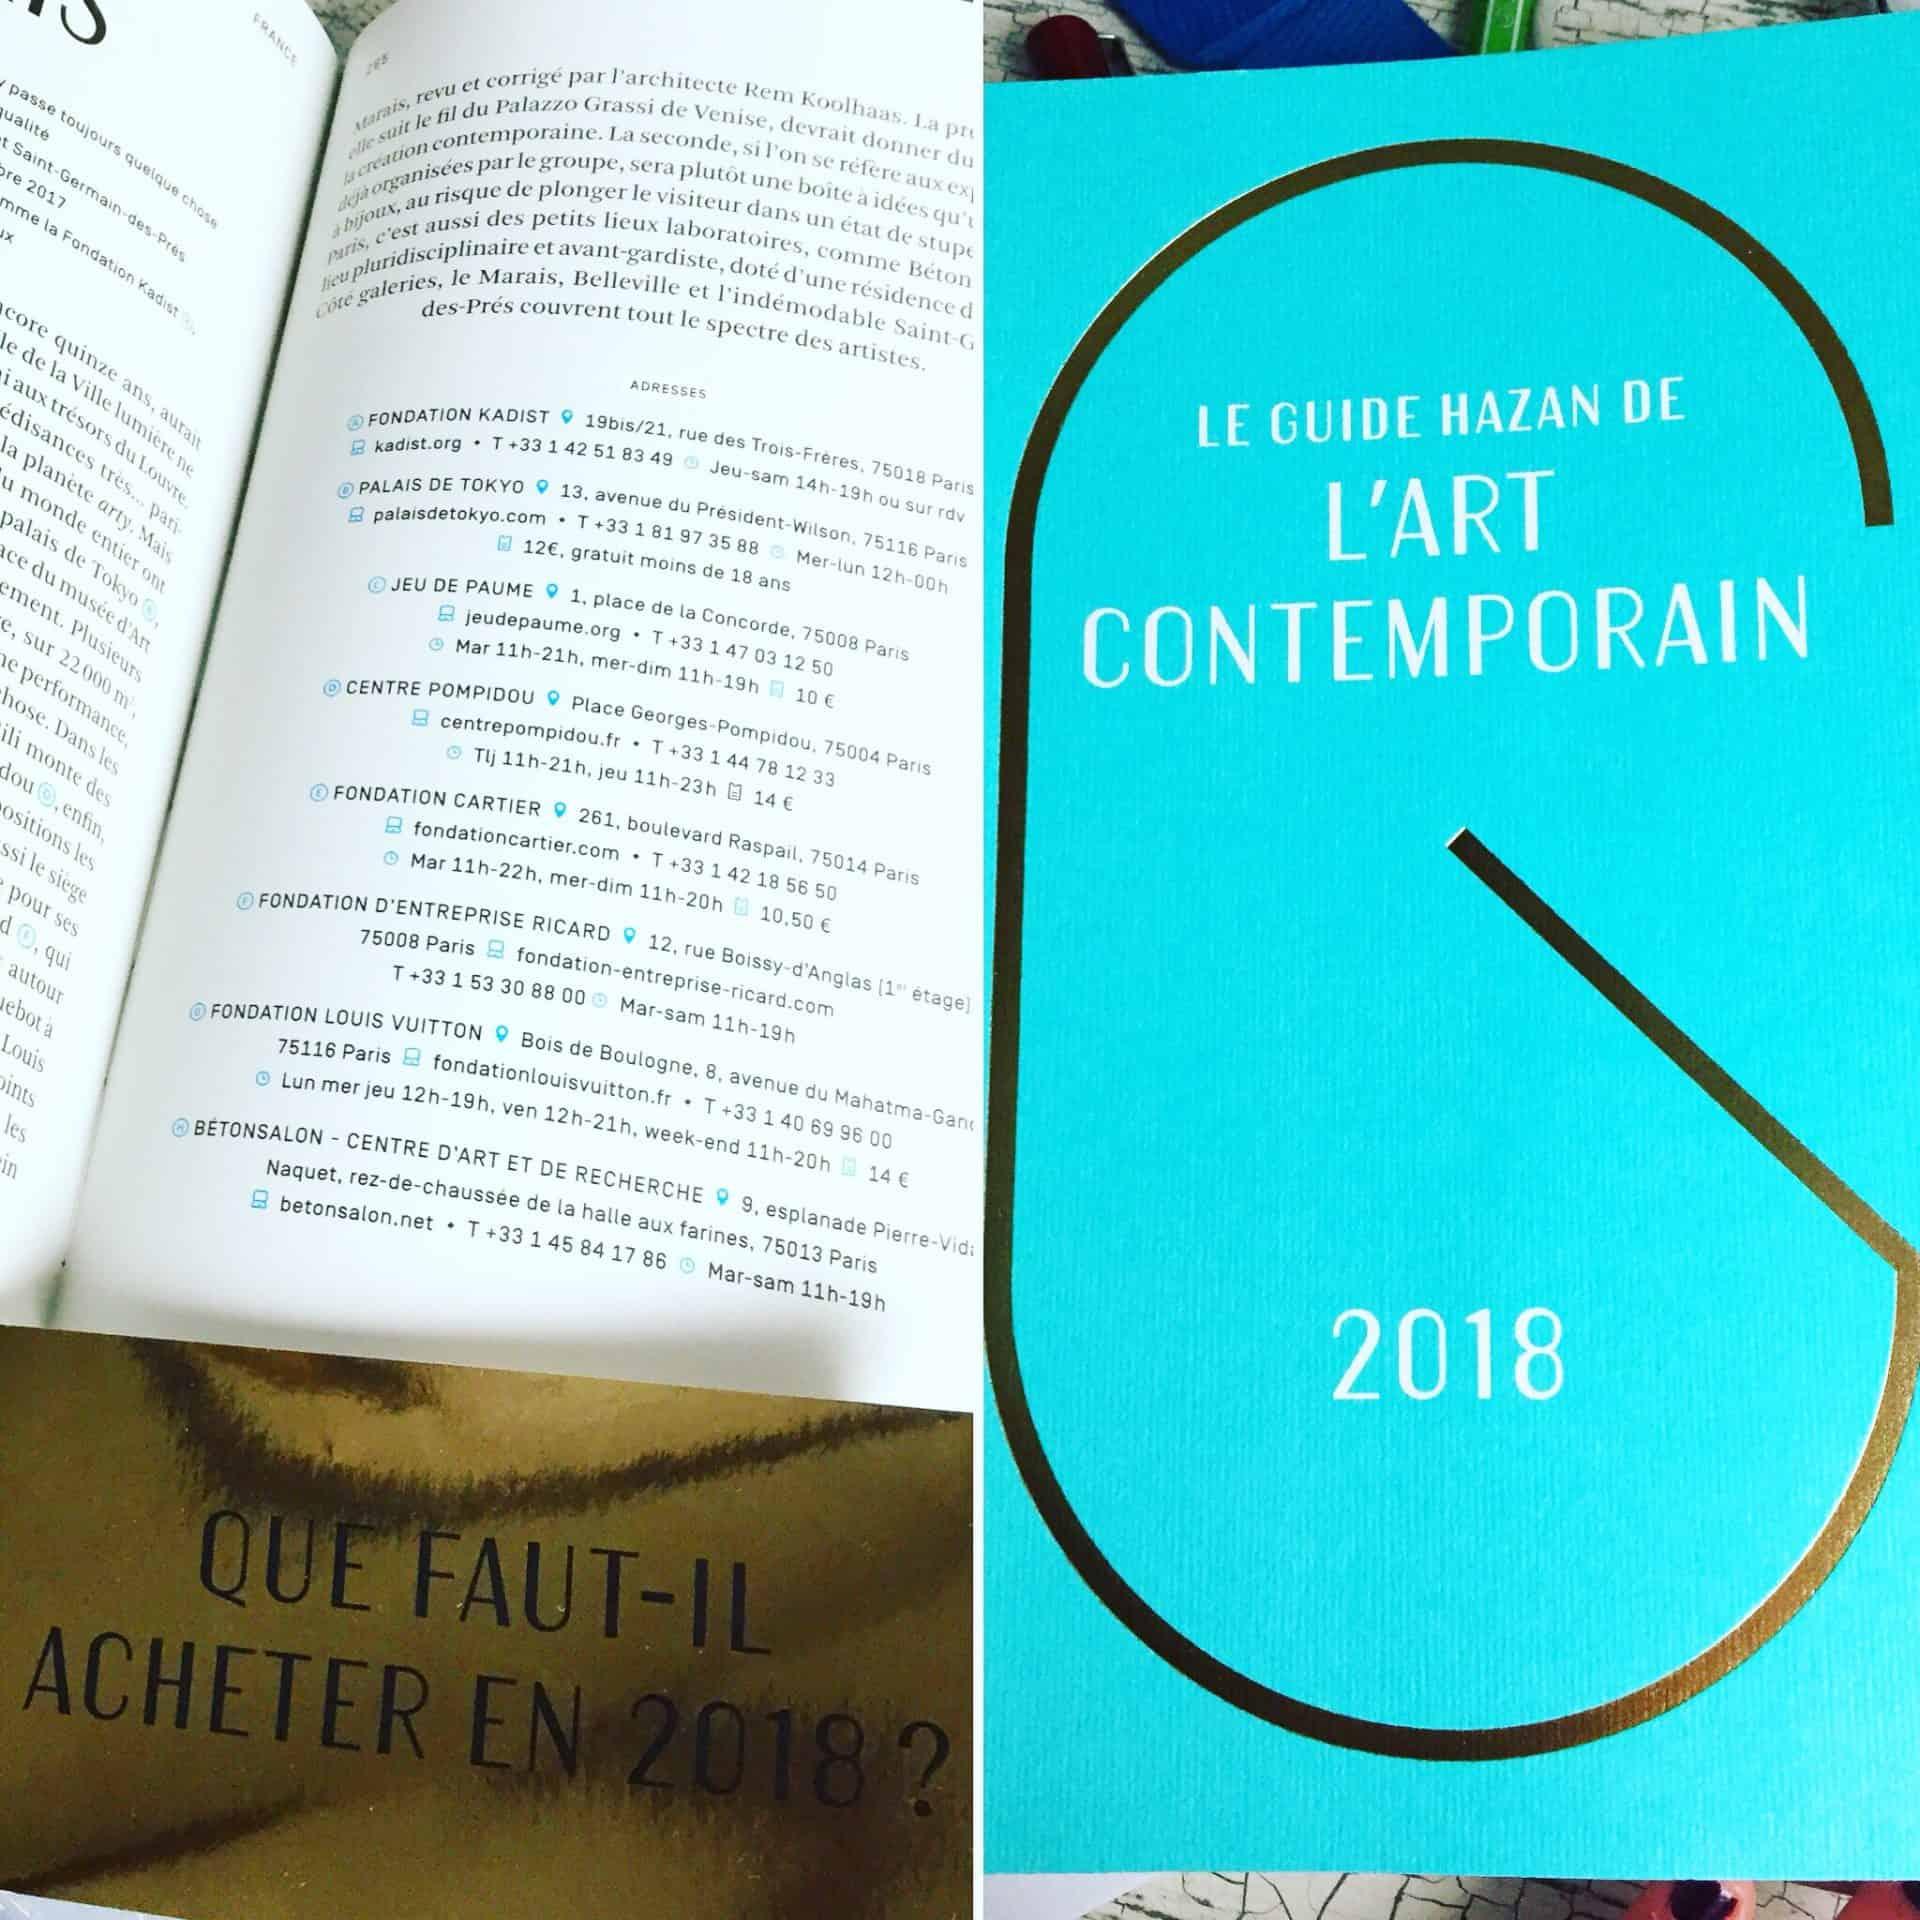 Guide Hazan de l'art contemporain 2018